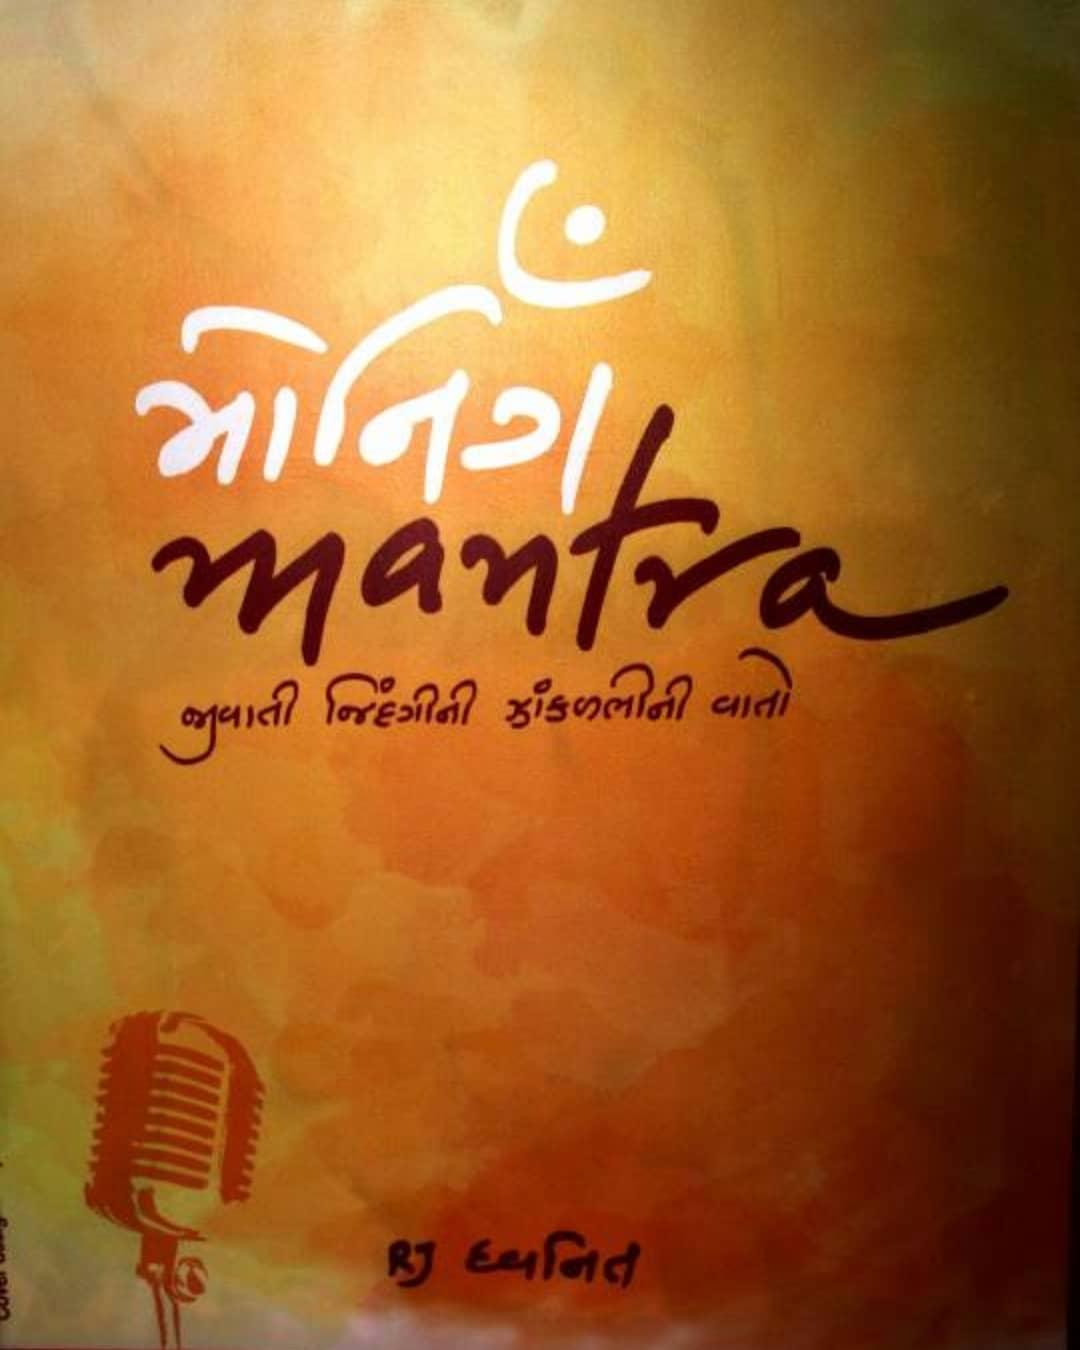 RJ Dhvanit,  morningmantra, book, gratitude, humbled, book, books, bookstagram, booklovers, booksofinstagram, booklaunch, motivation, inspiration, inspring, dhvanit